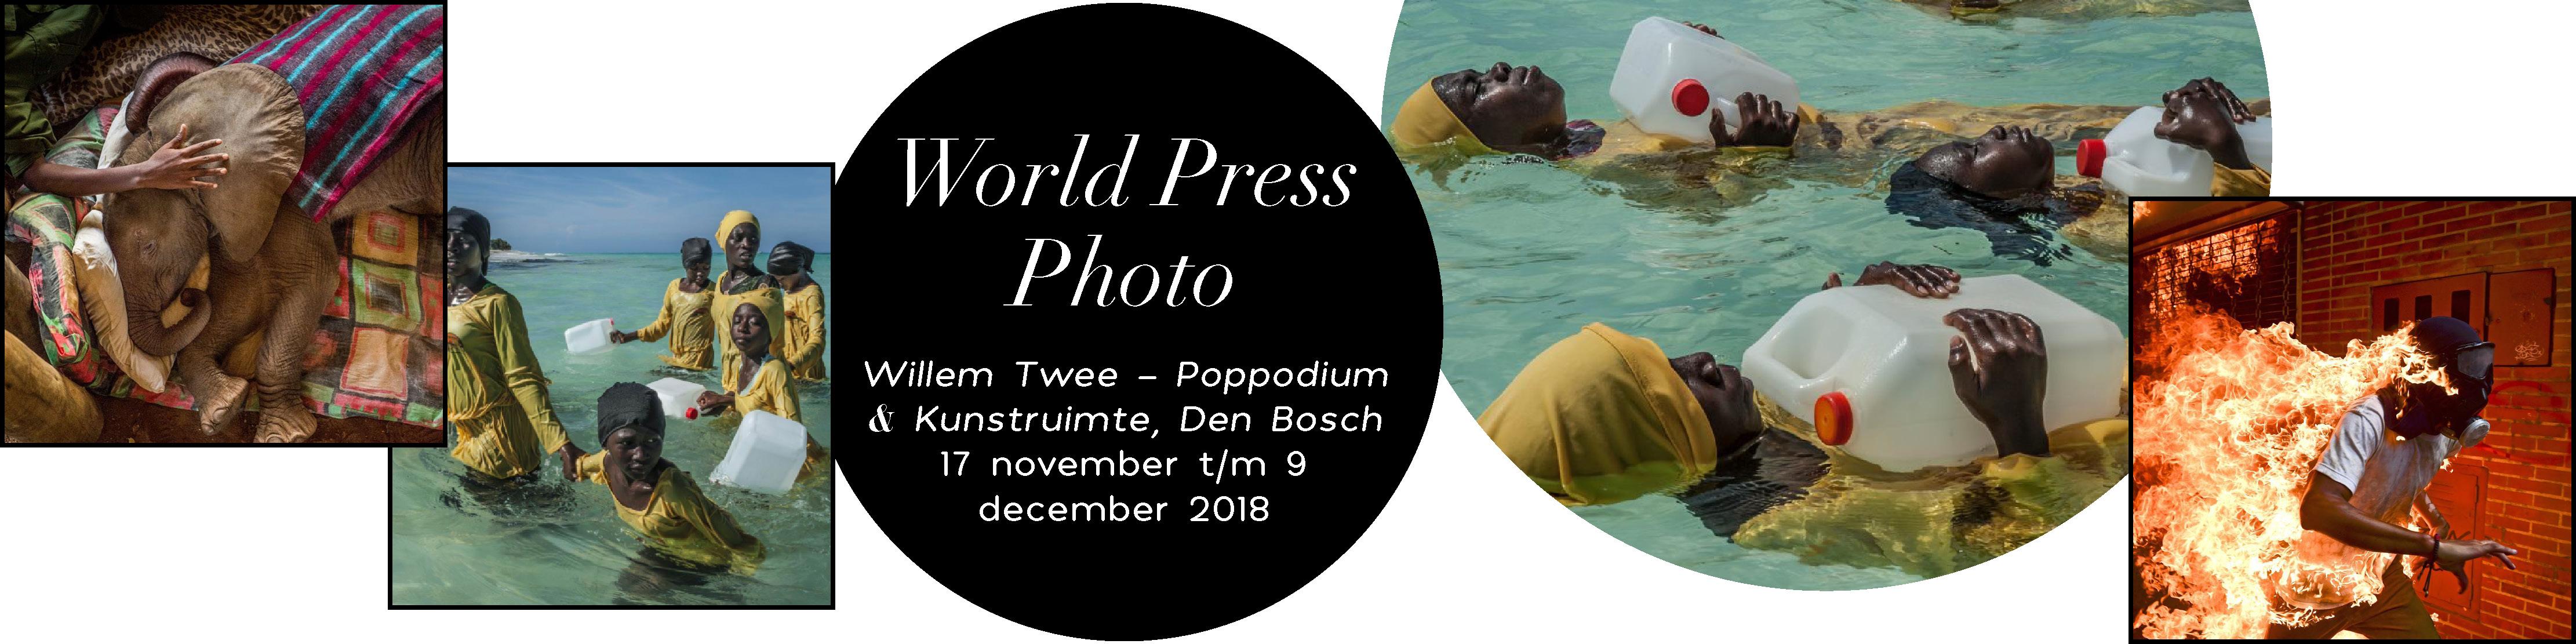 Voluit - dagjes weg - World Press photo